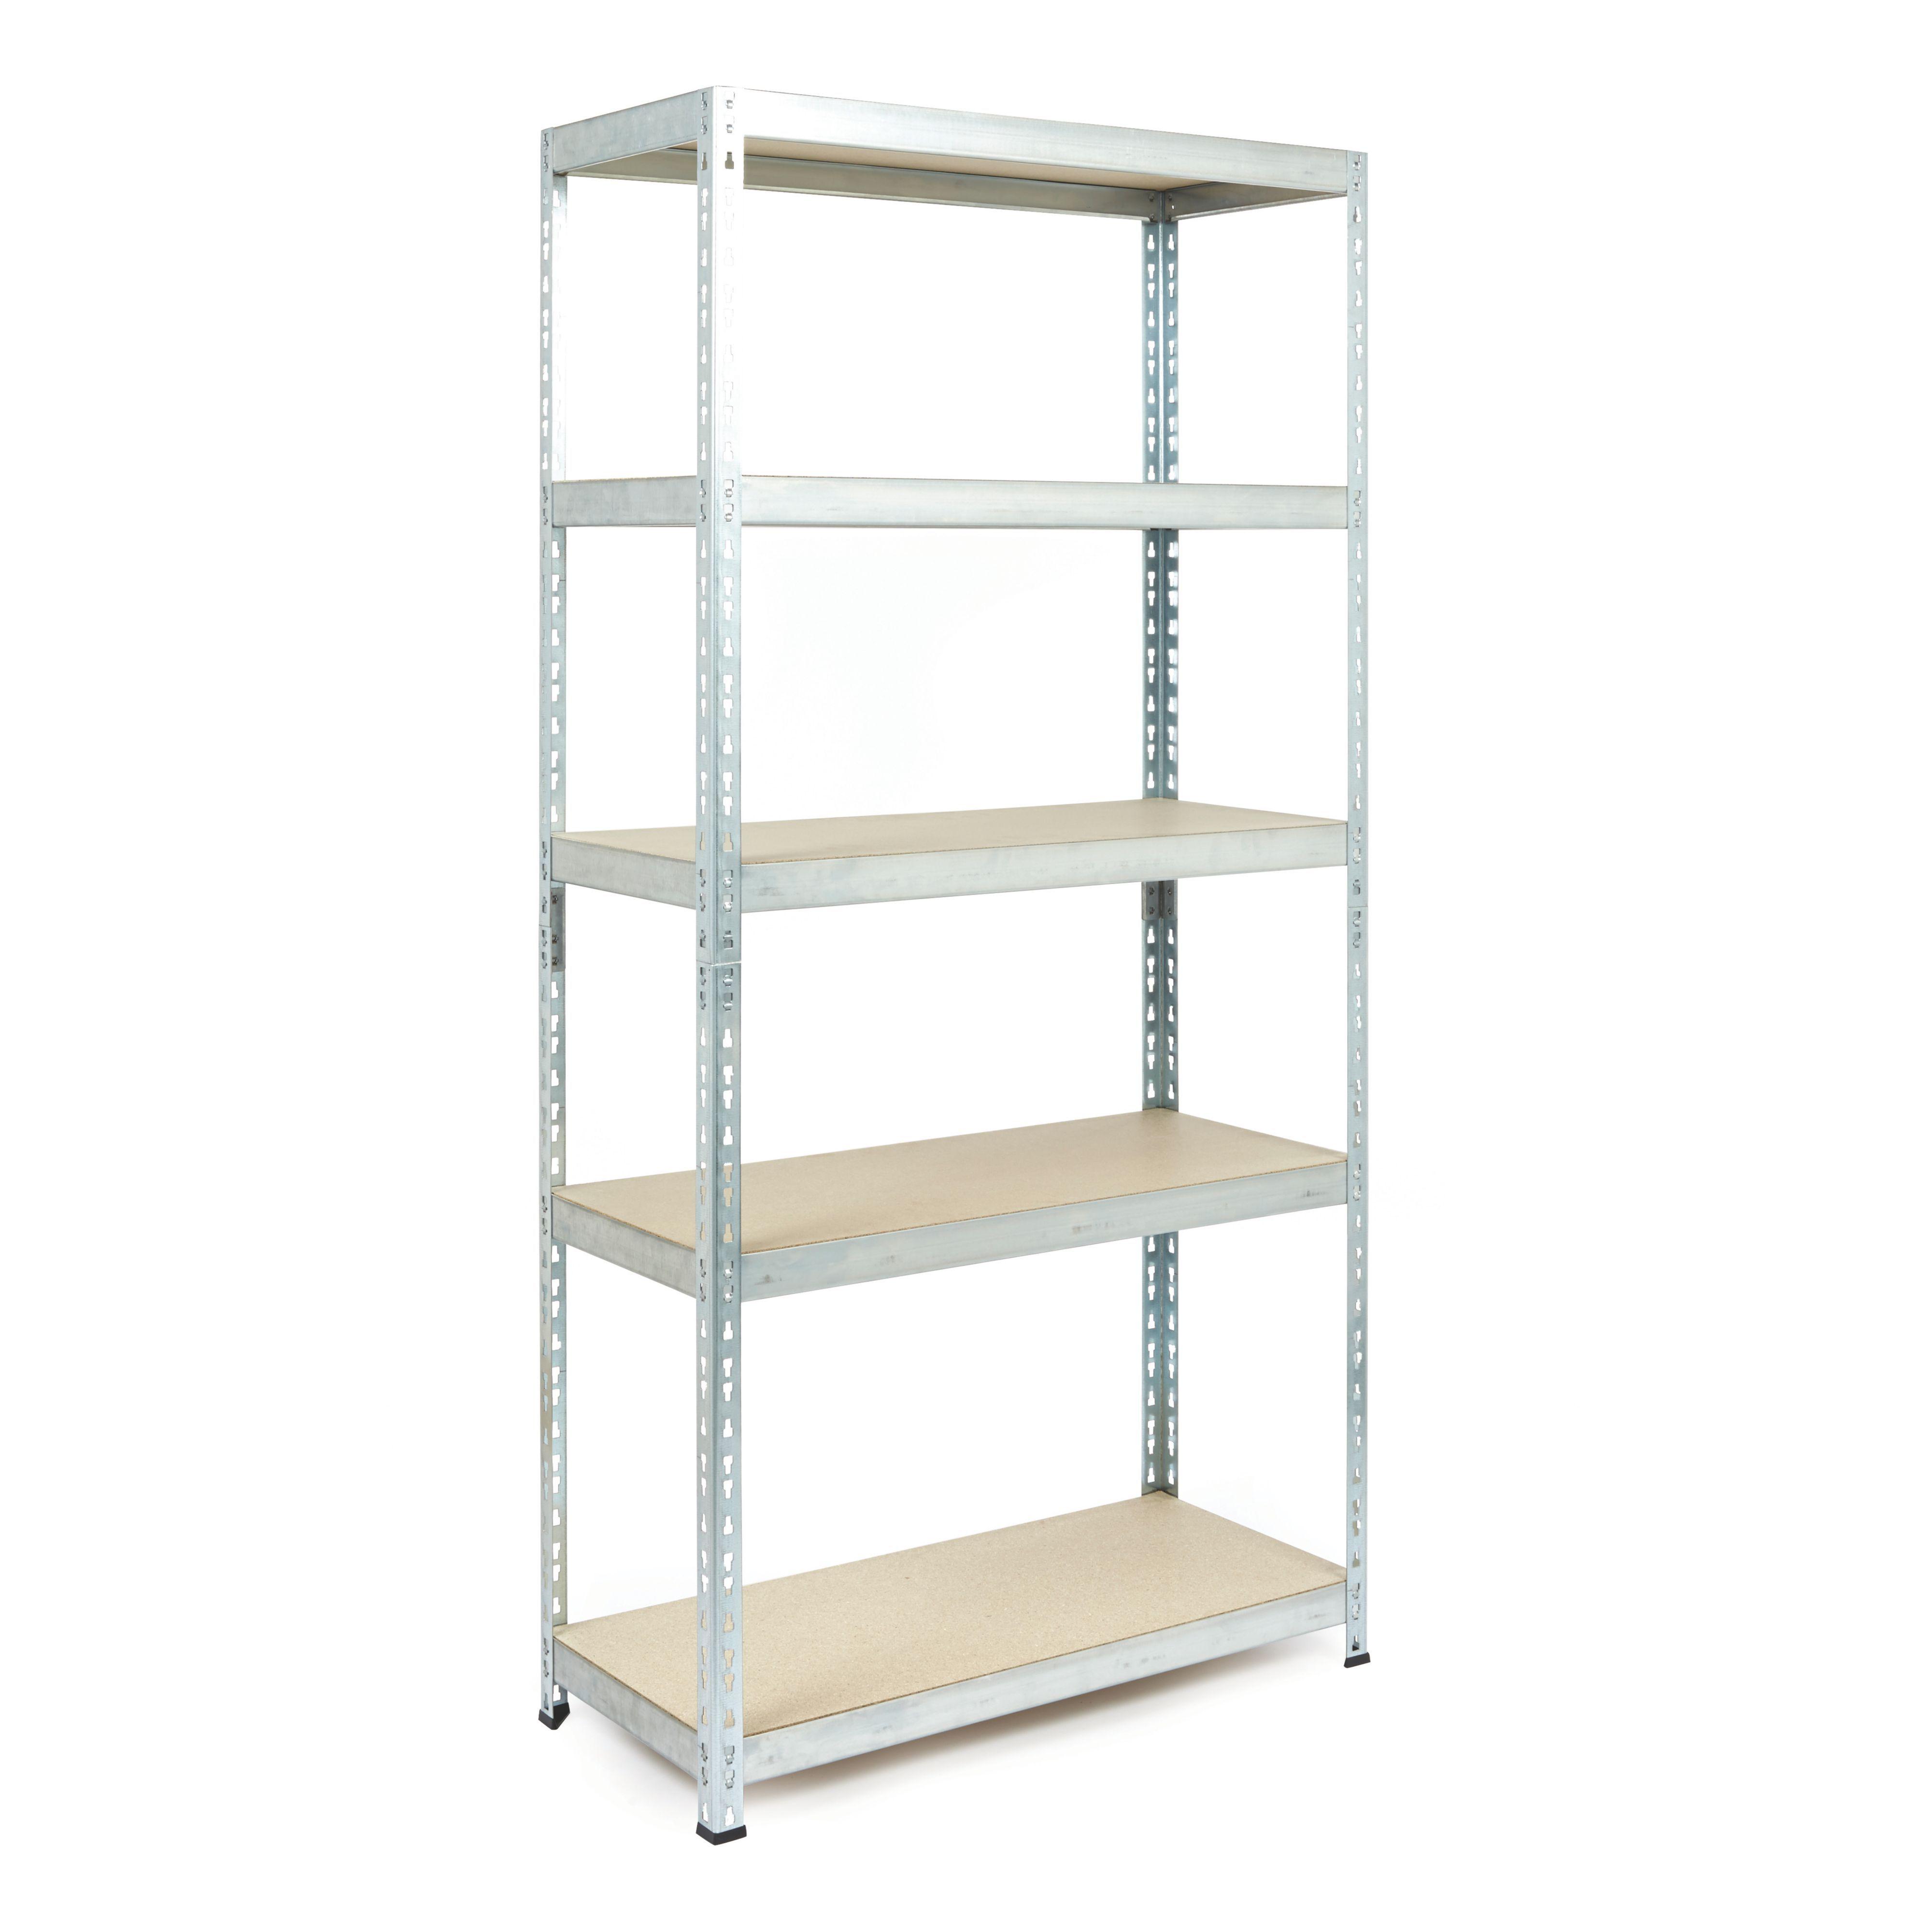 5 Shelf Metal Shelving Unit | Departments | DIY at B&Q